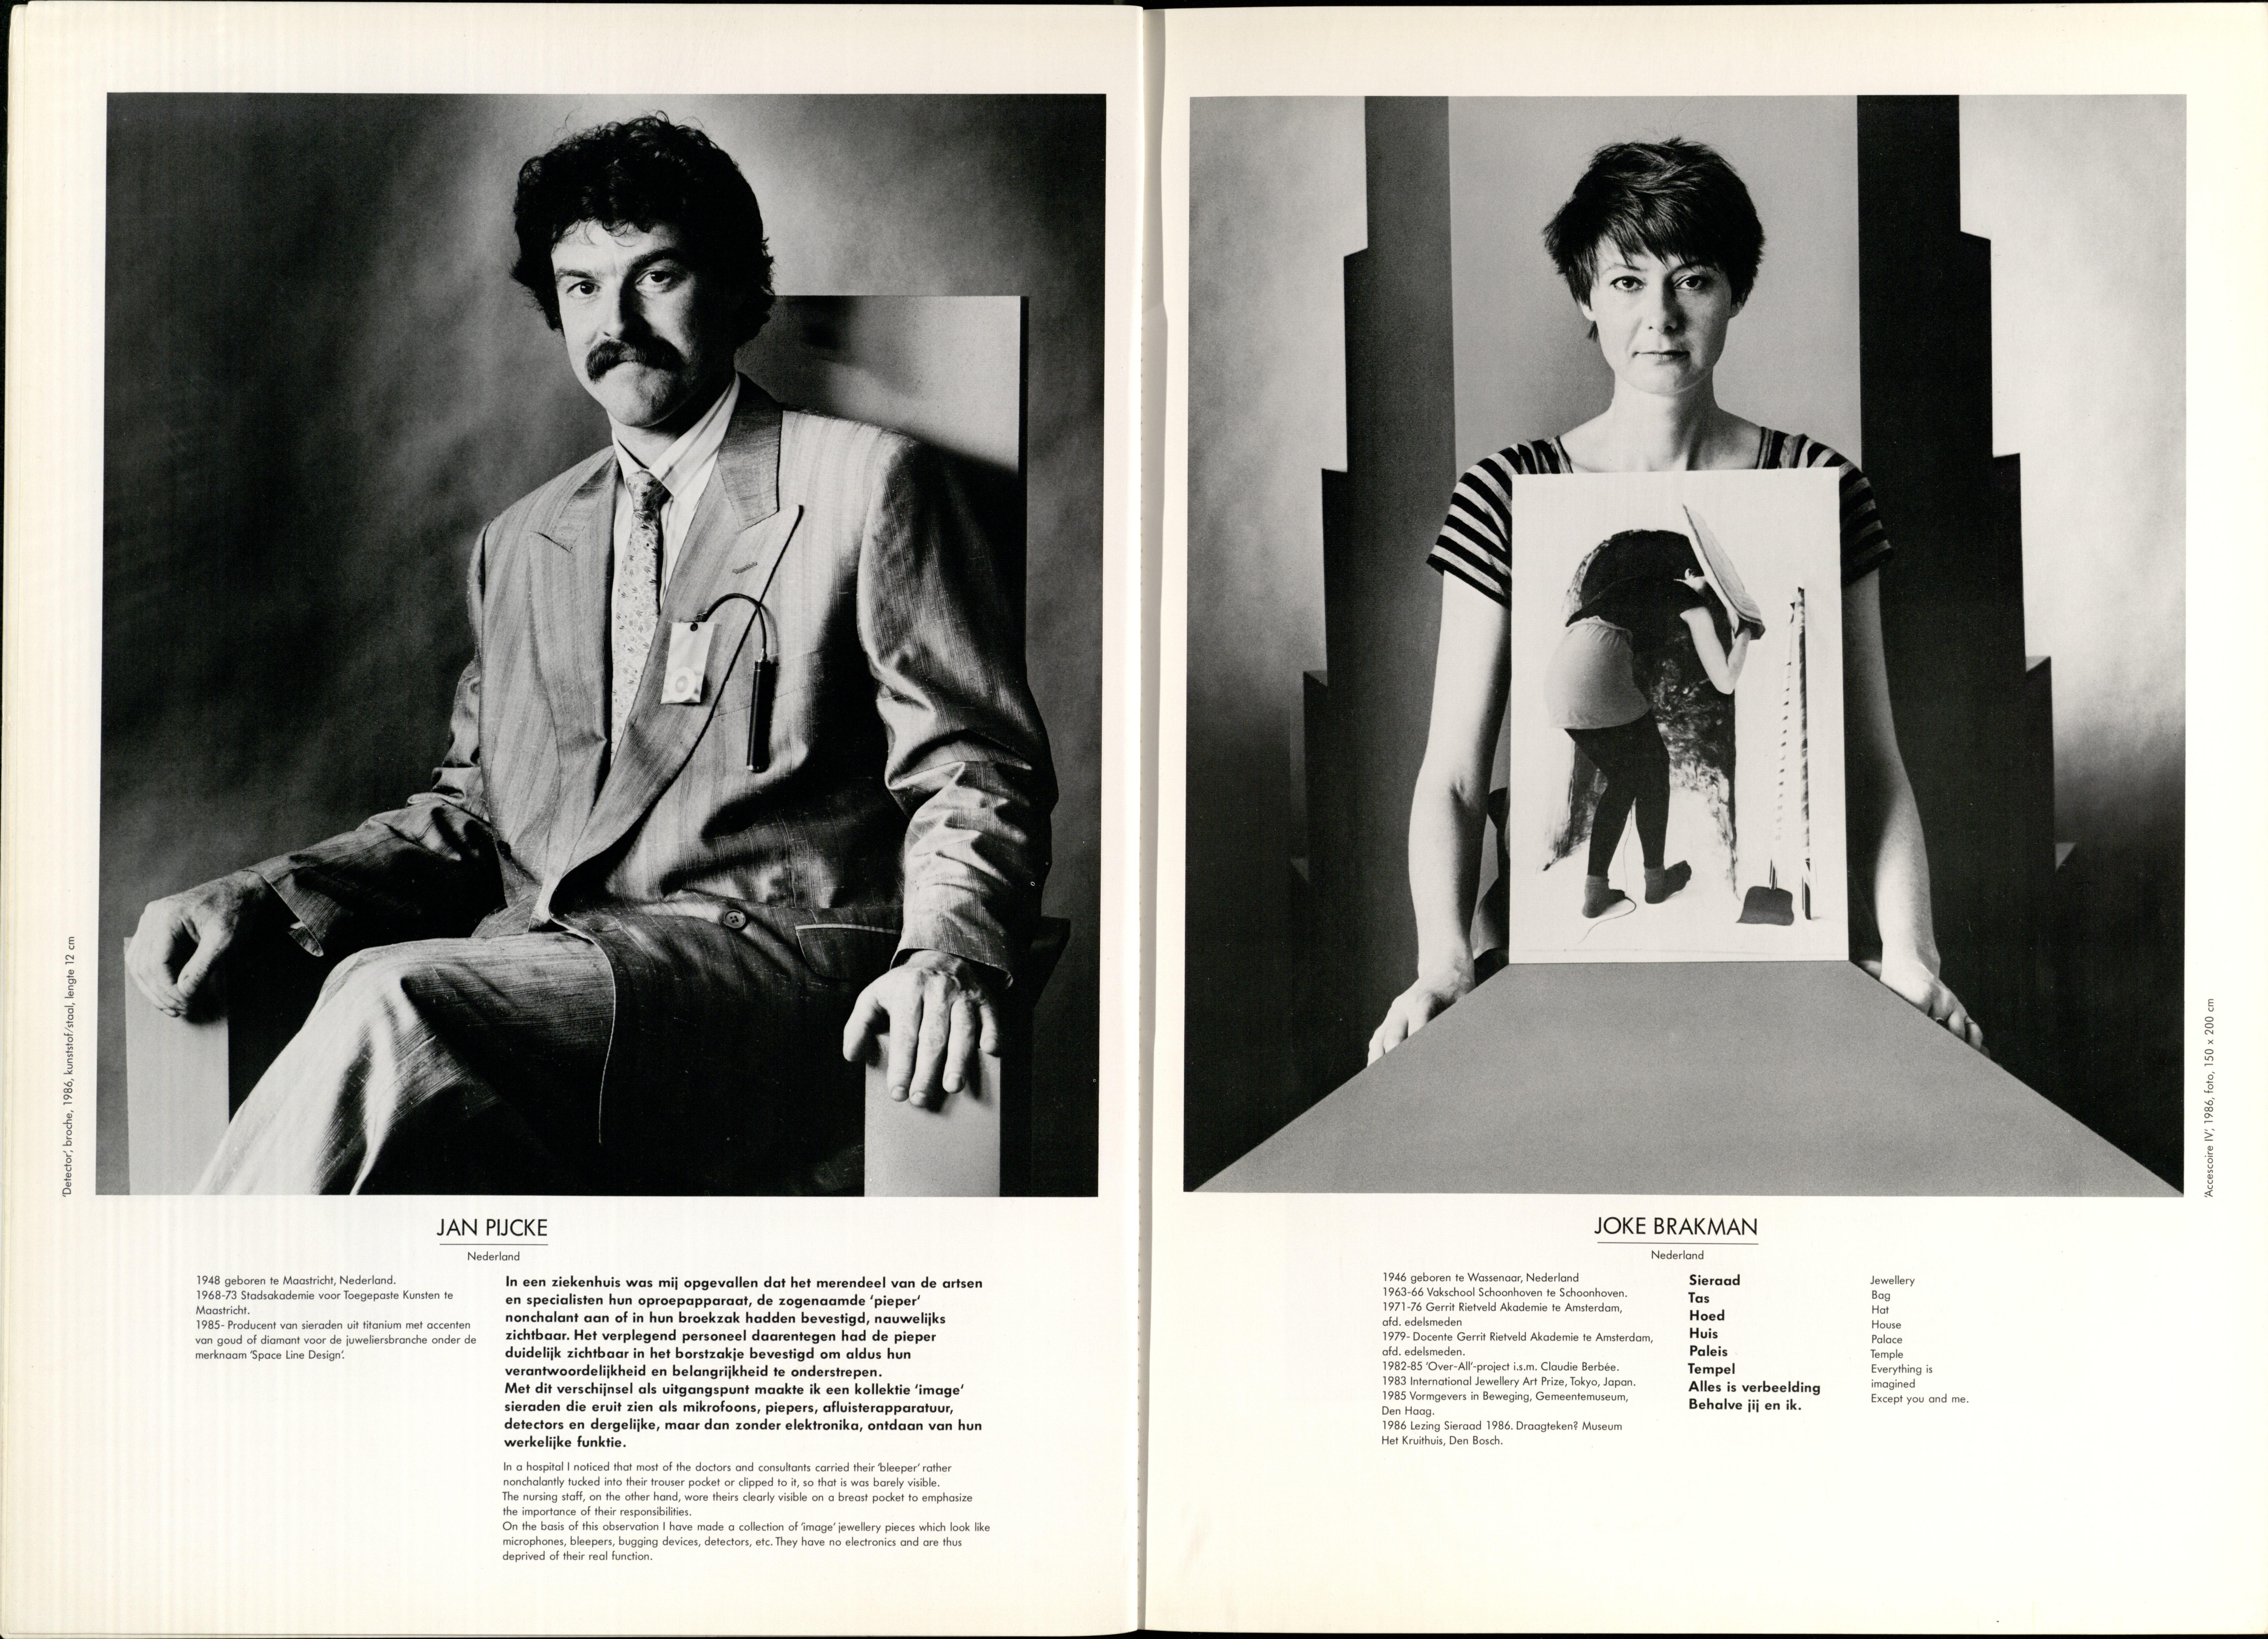 10 Jaar Ra, bladzijde 8 en 9, Jan Pijcke en Joke Brakman, 1986, foto's Anna Beeke, portret, broche, drukwerk, papier